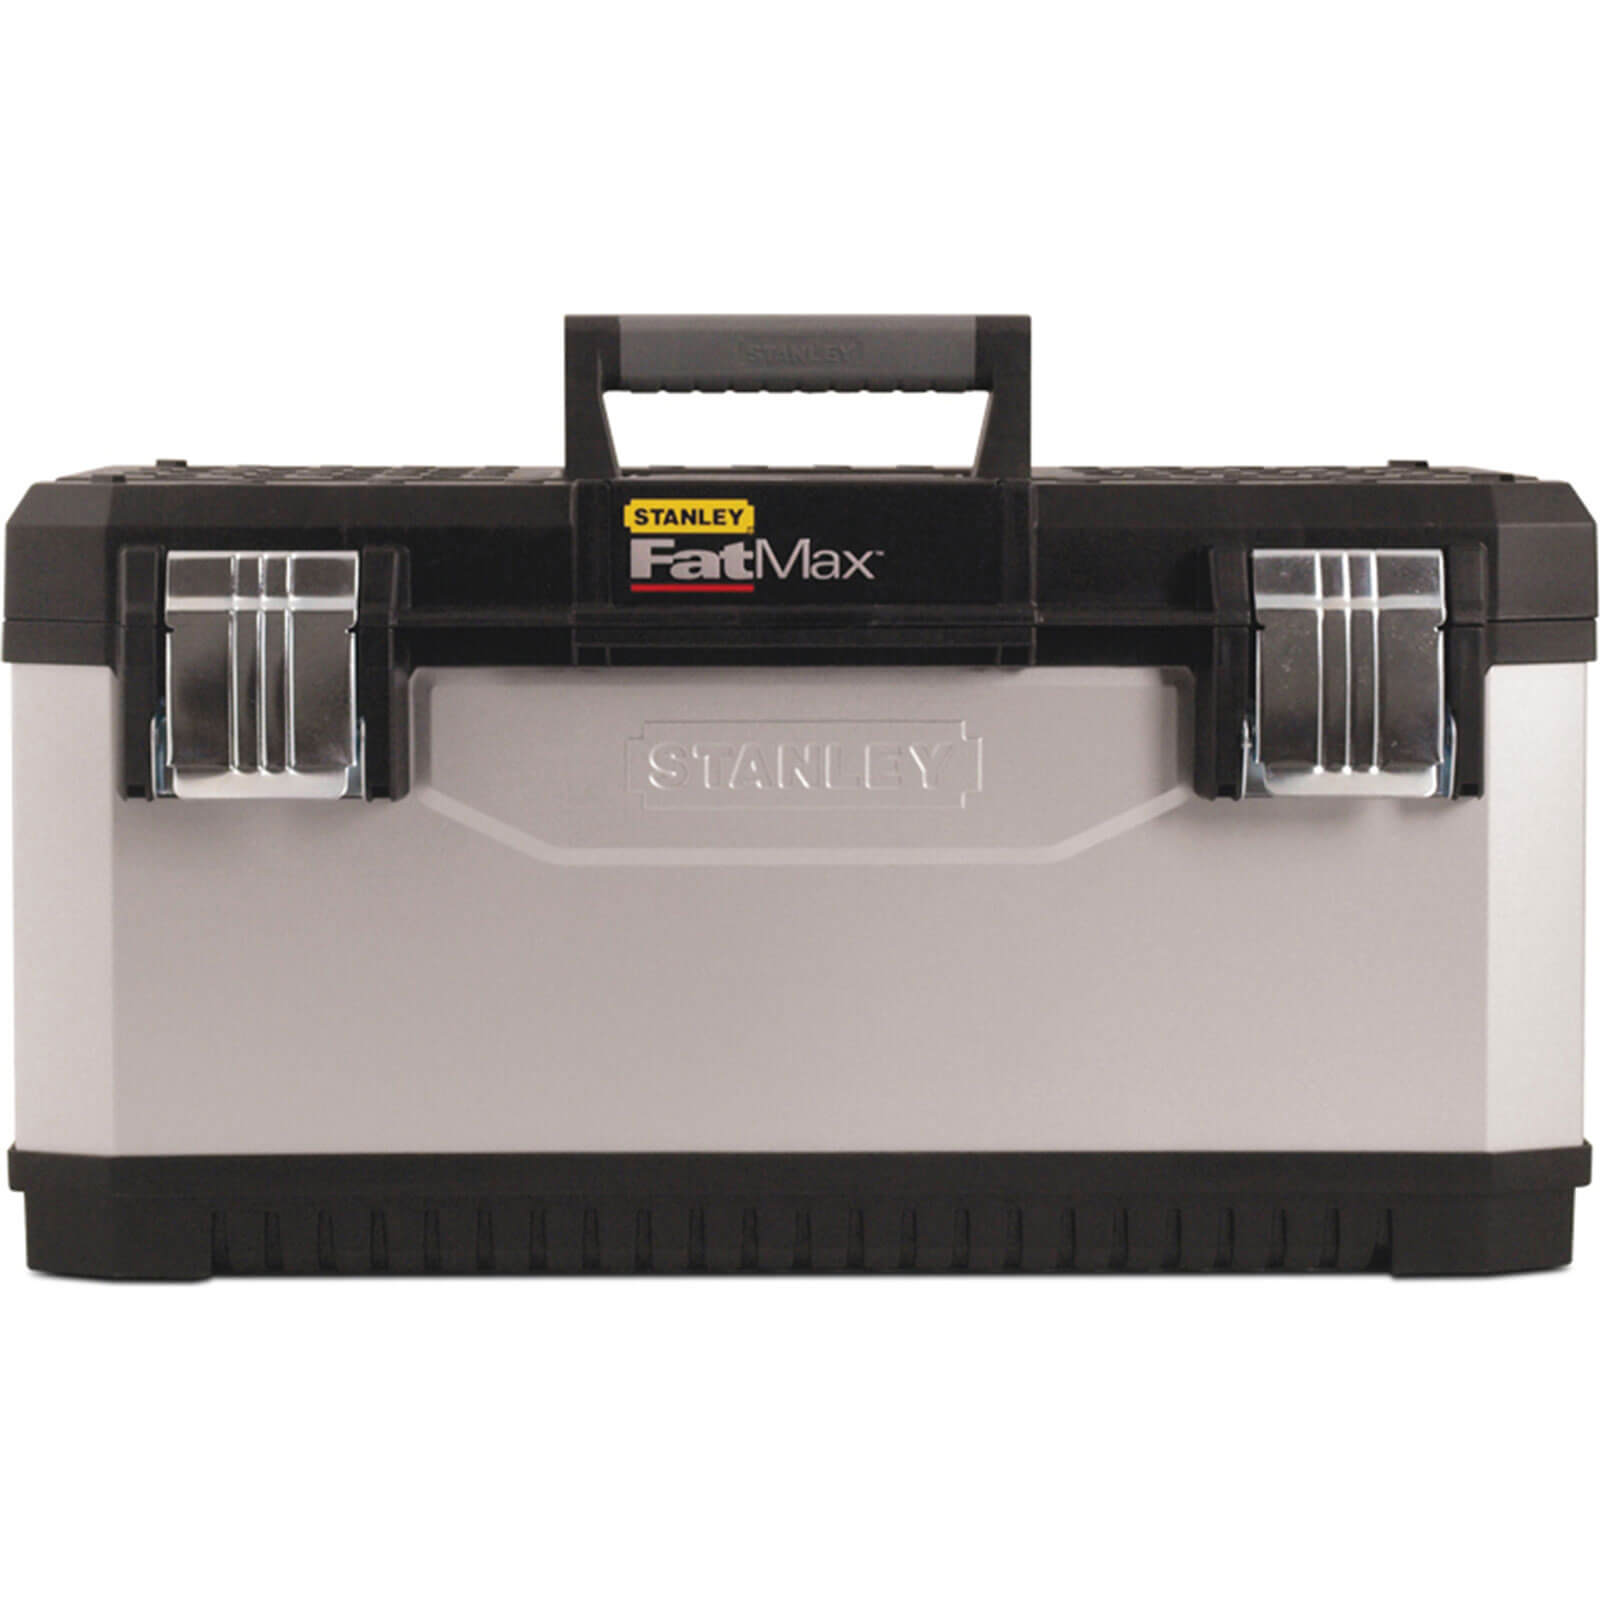 Image of Stanley FatMax Metal and Plastic Tool Box 500mm